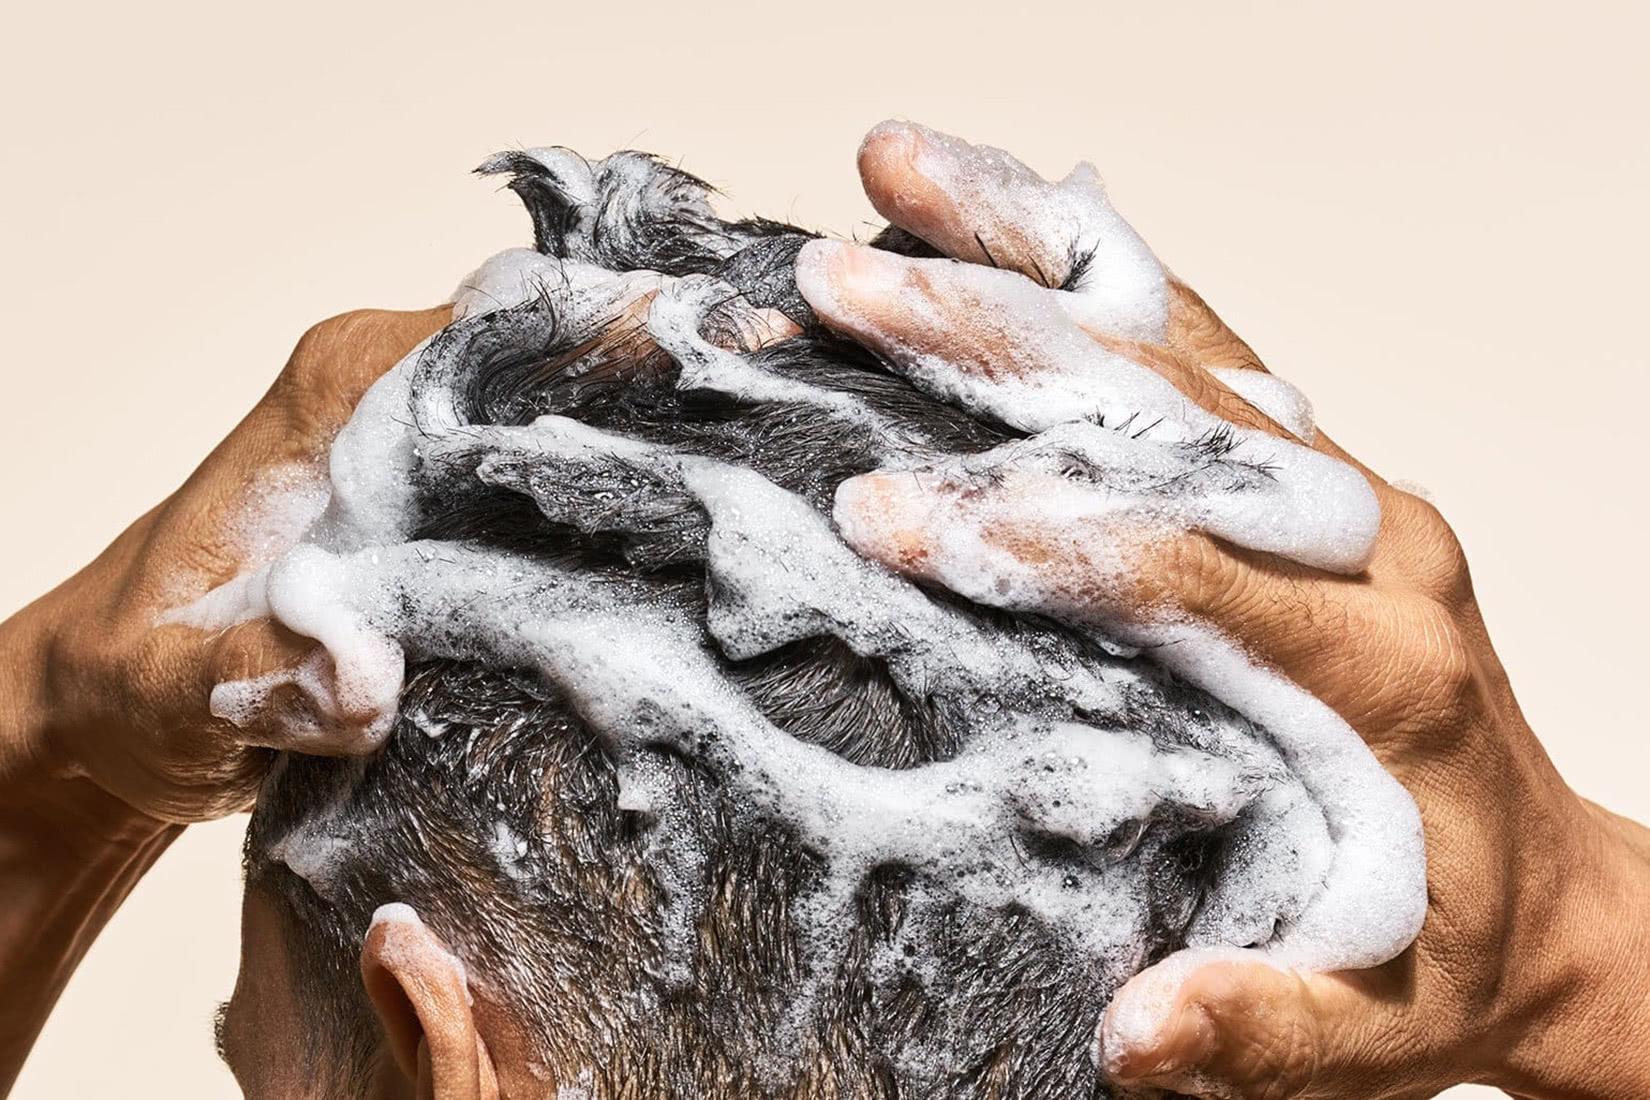 hims hair loss shampoo review - Luxe Digital